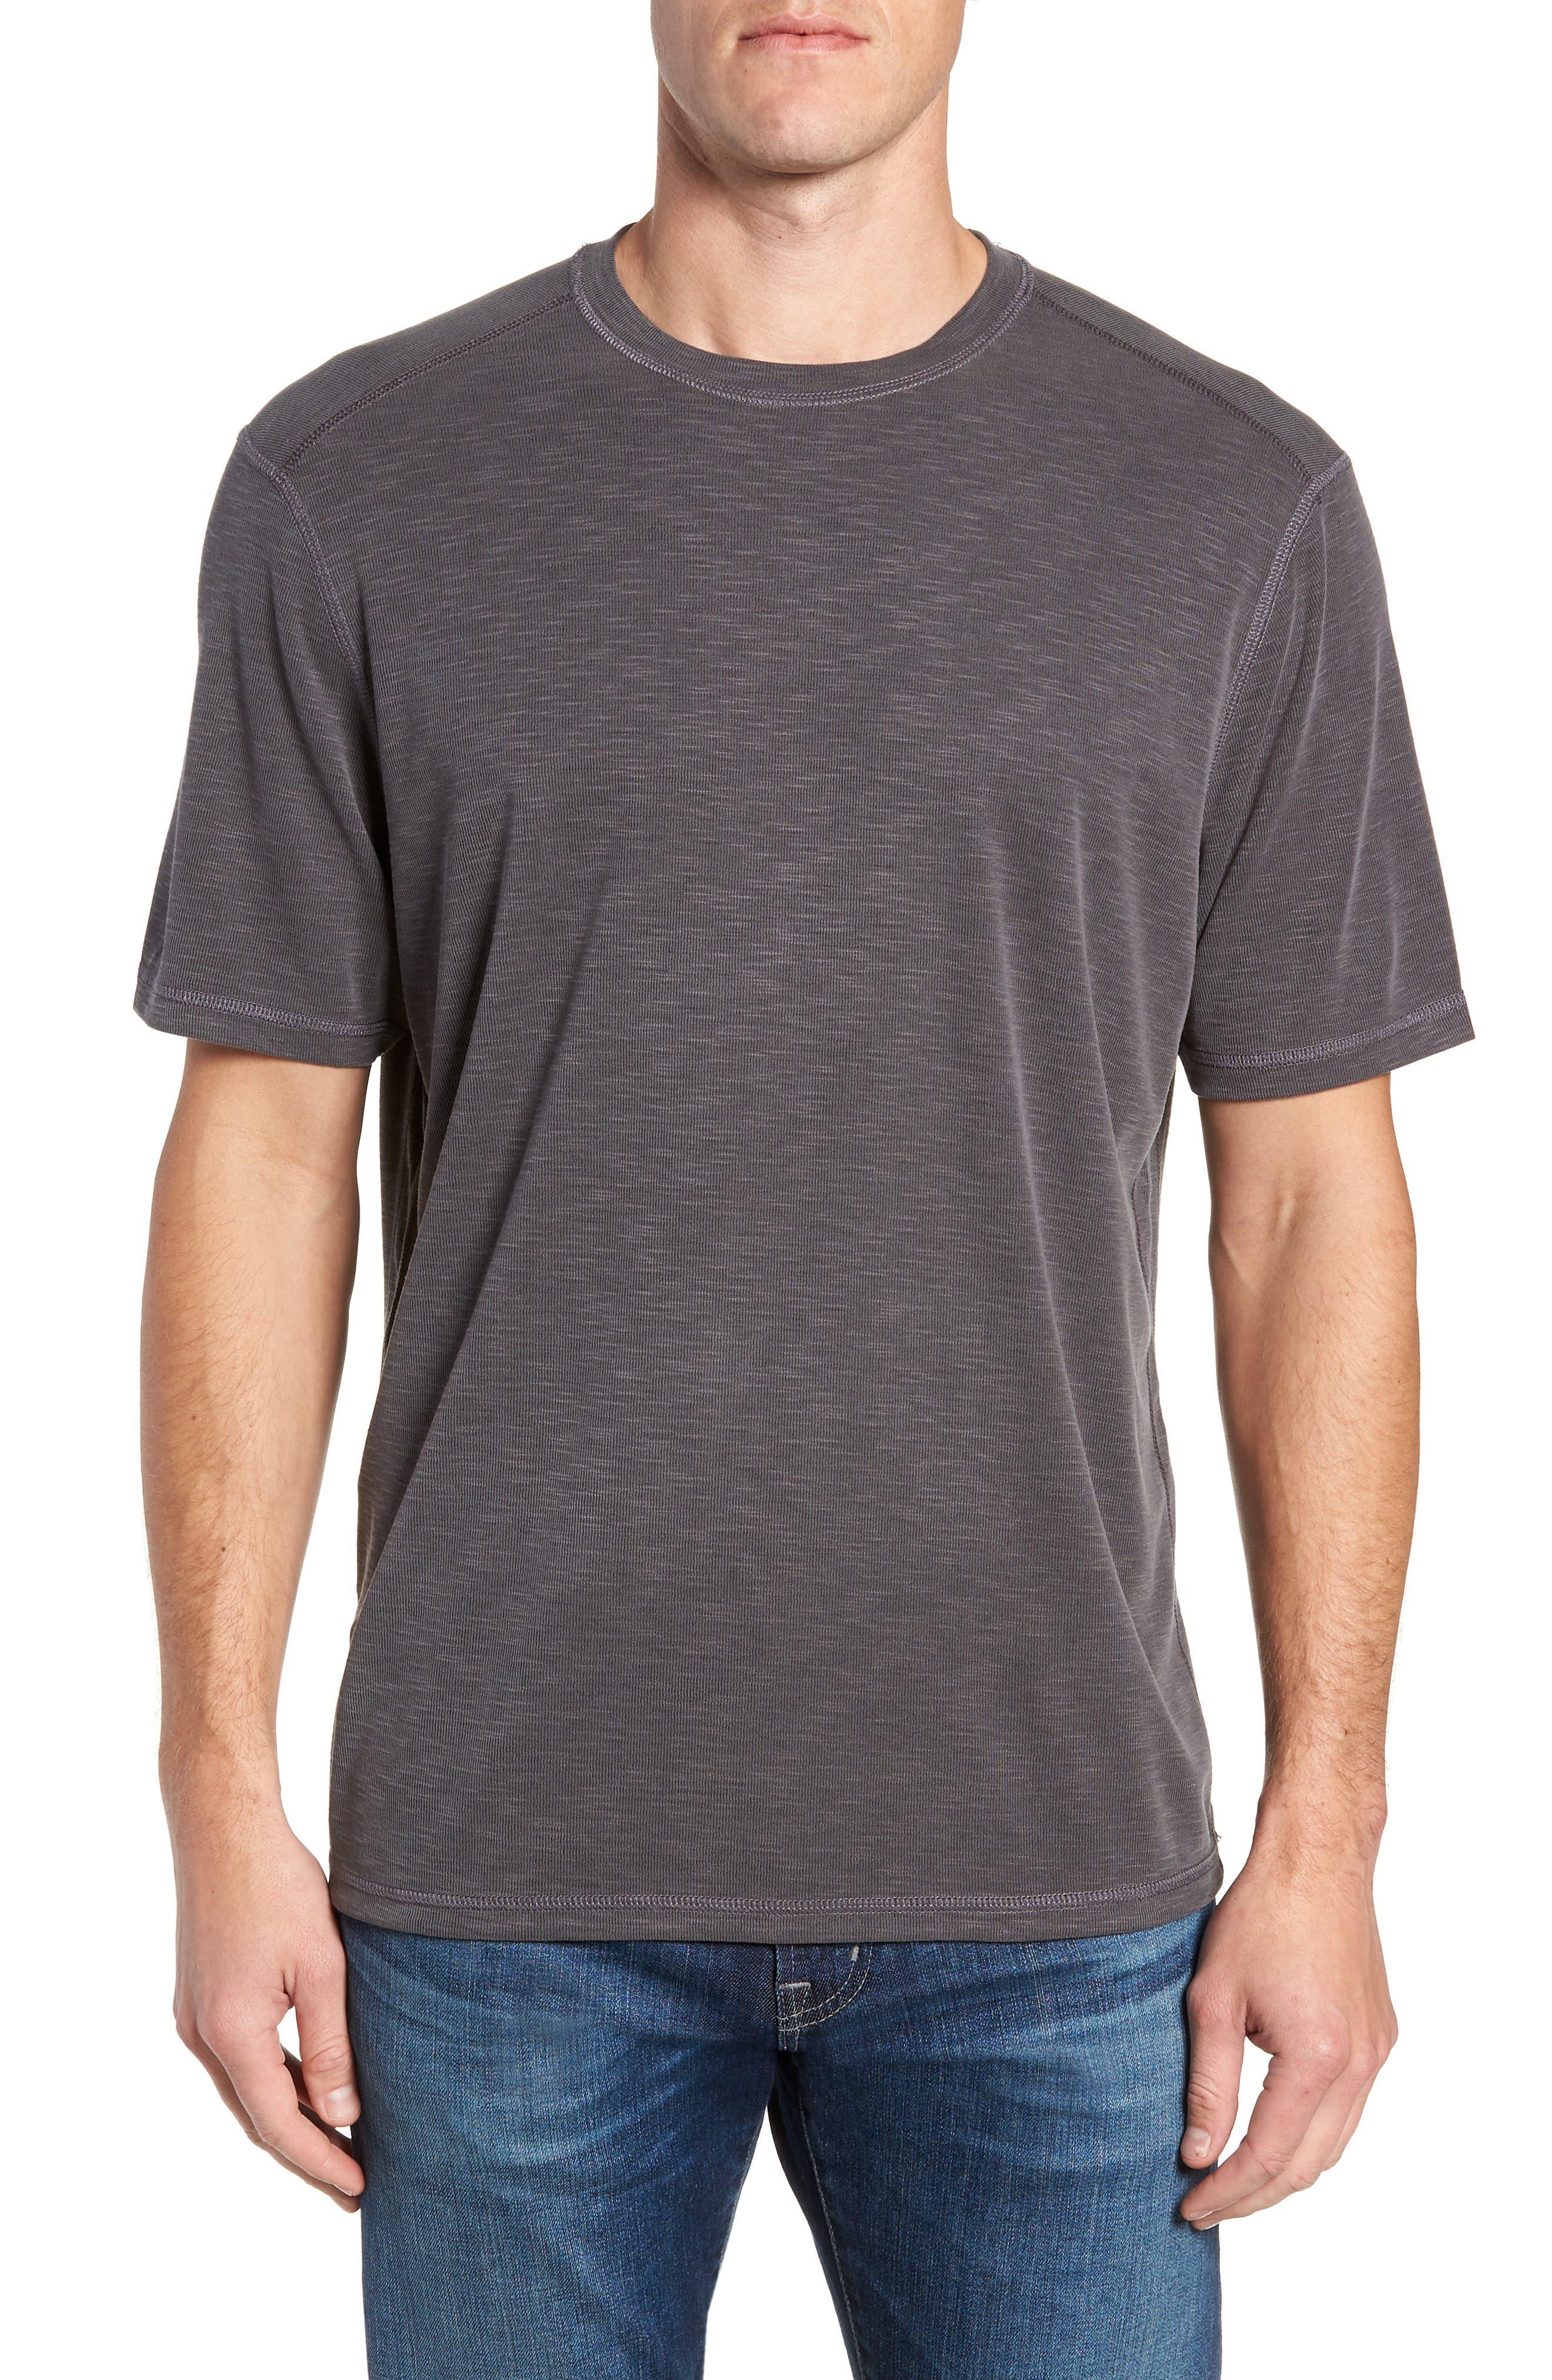 c76ef1f19b75 Tommy Bahama Men's T-Shirts, stylish comfort clothing